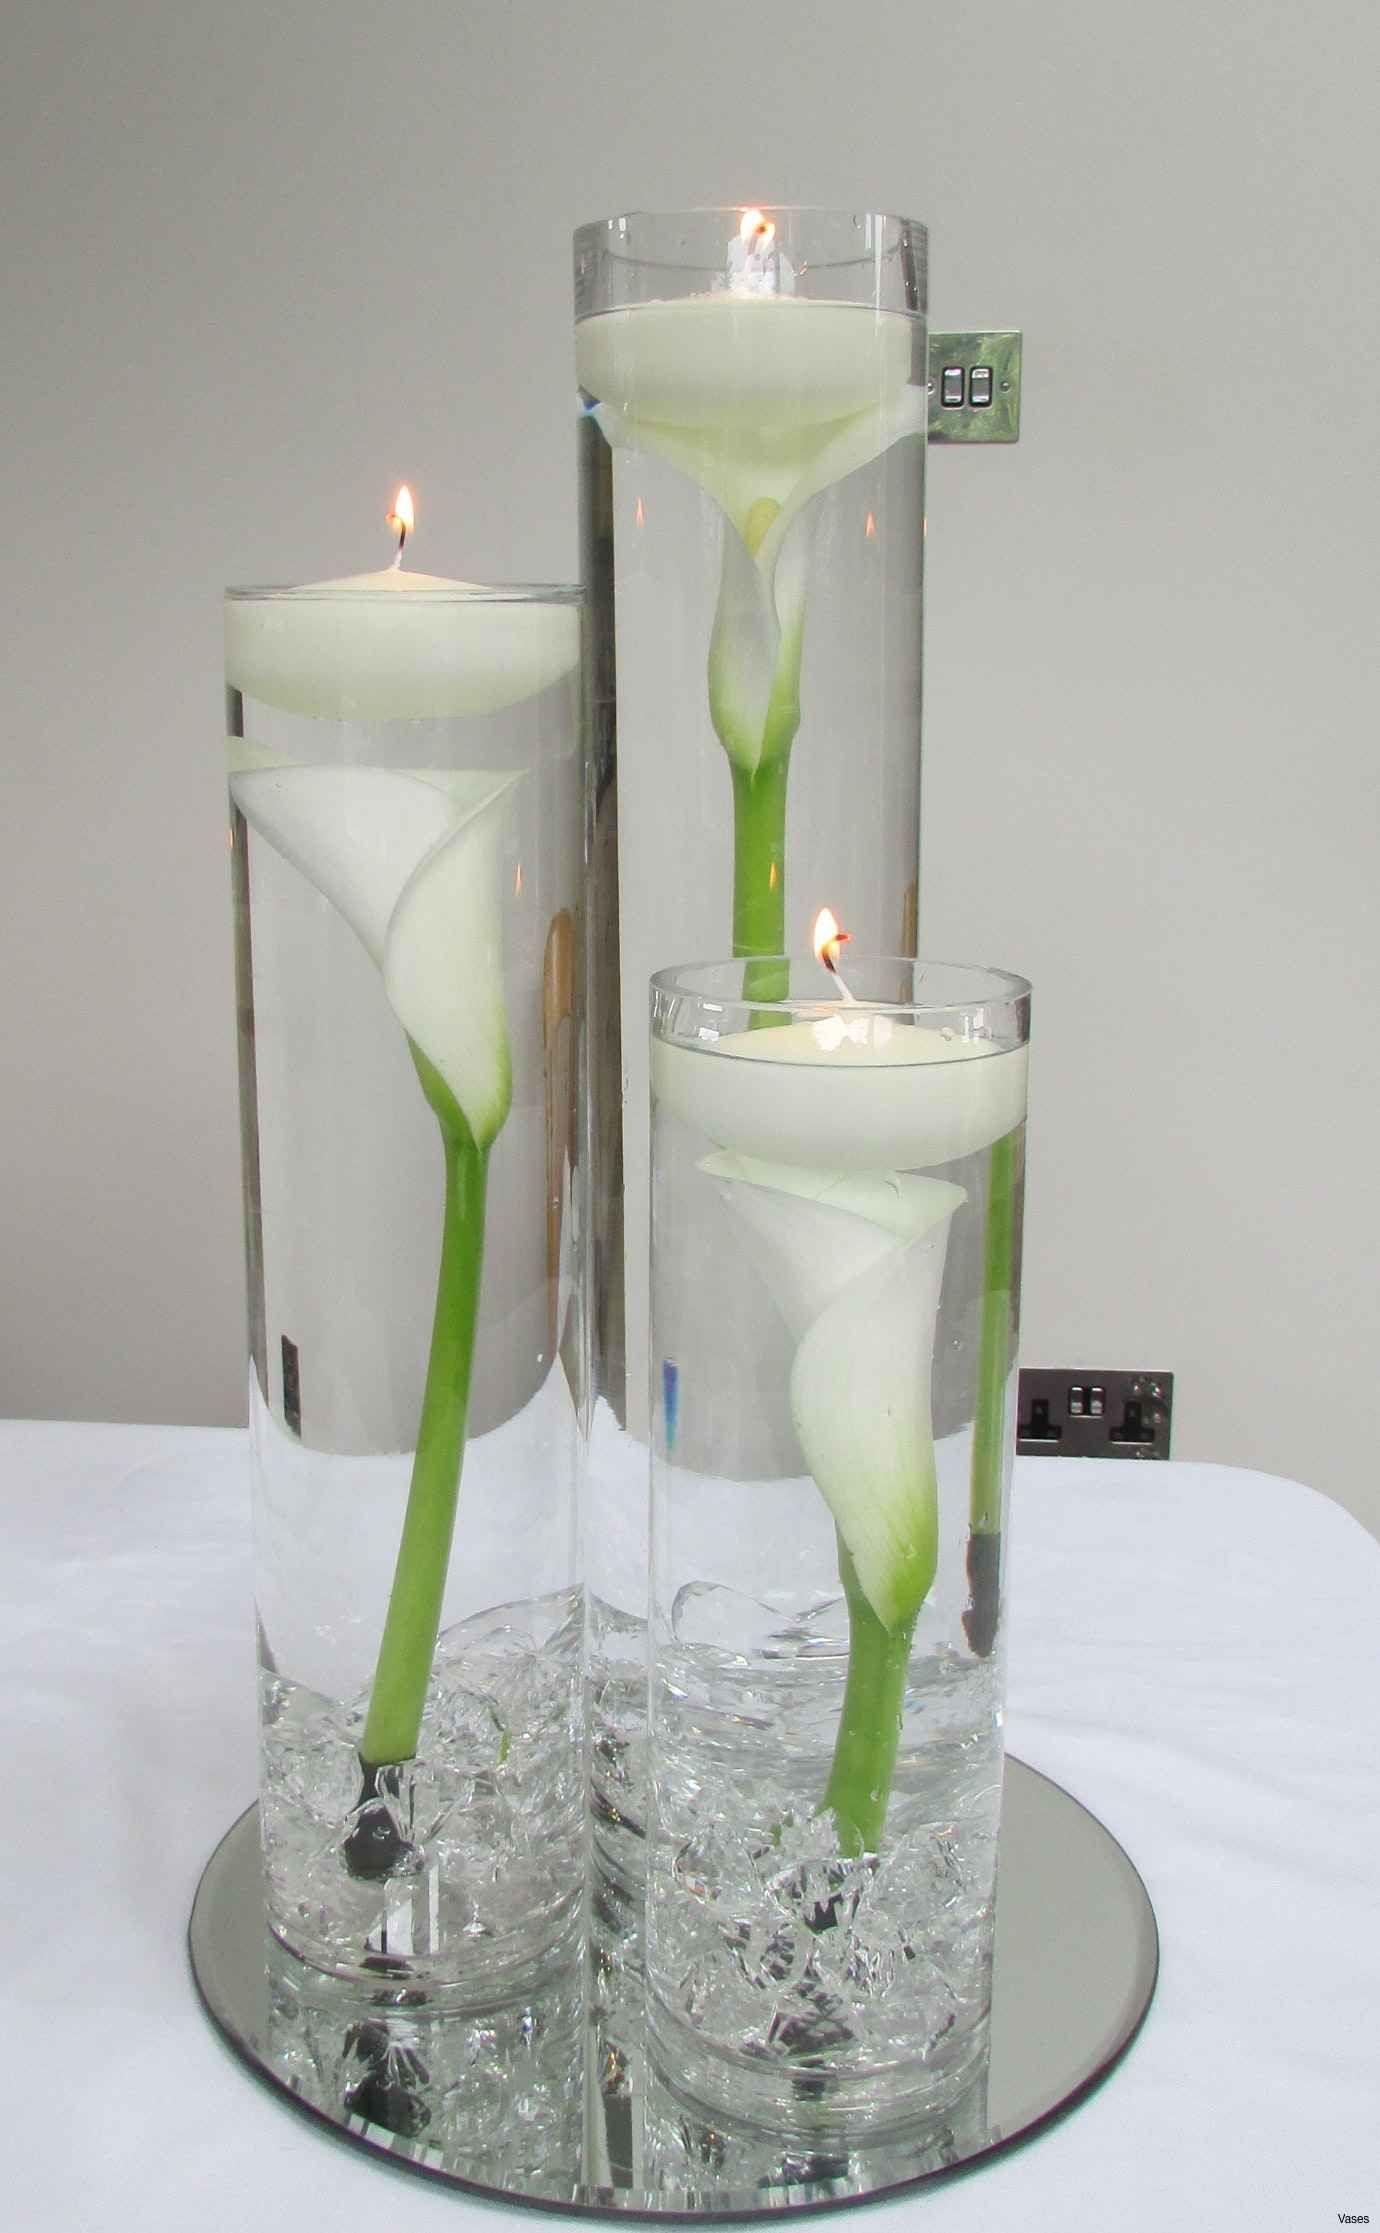 Round Vase Flower Arrangements Of 34 Gold Mercury Glass Vases the Weekly World Regarding Vases Floating Candle Vase Set Glass Holdersi 0d Centerpieces Dollar